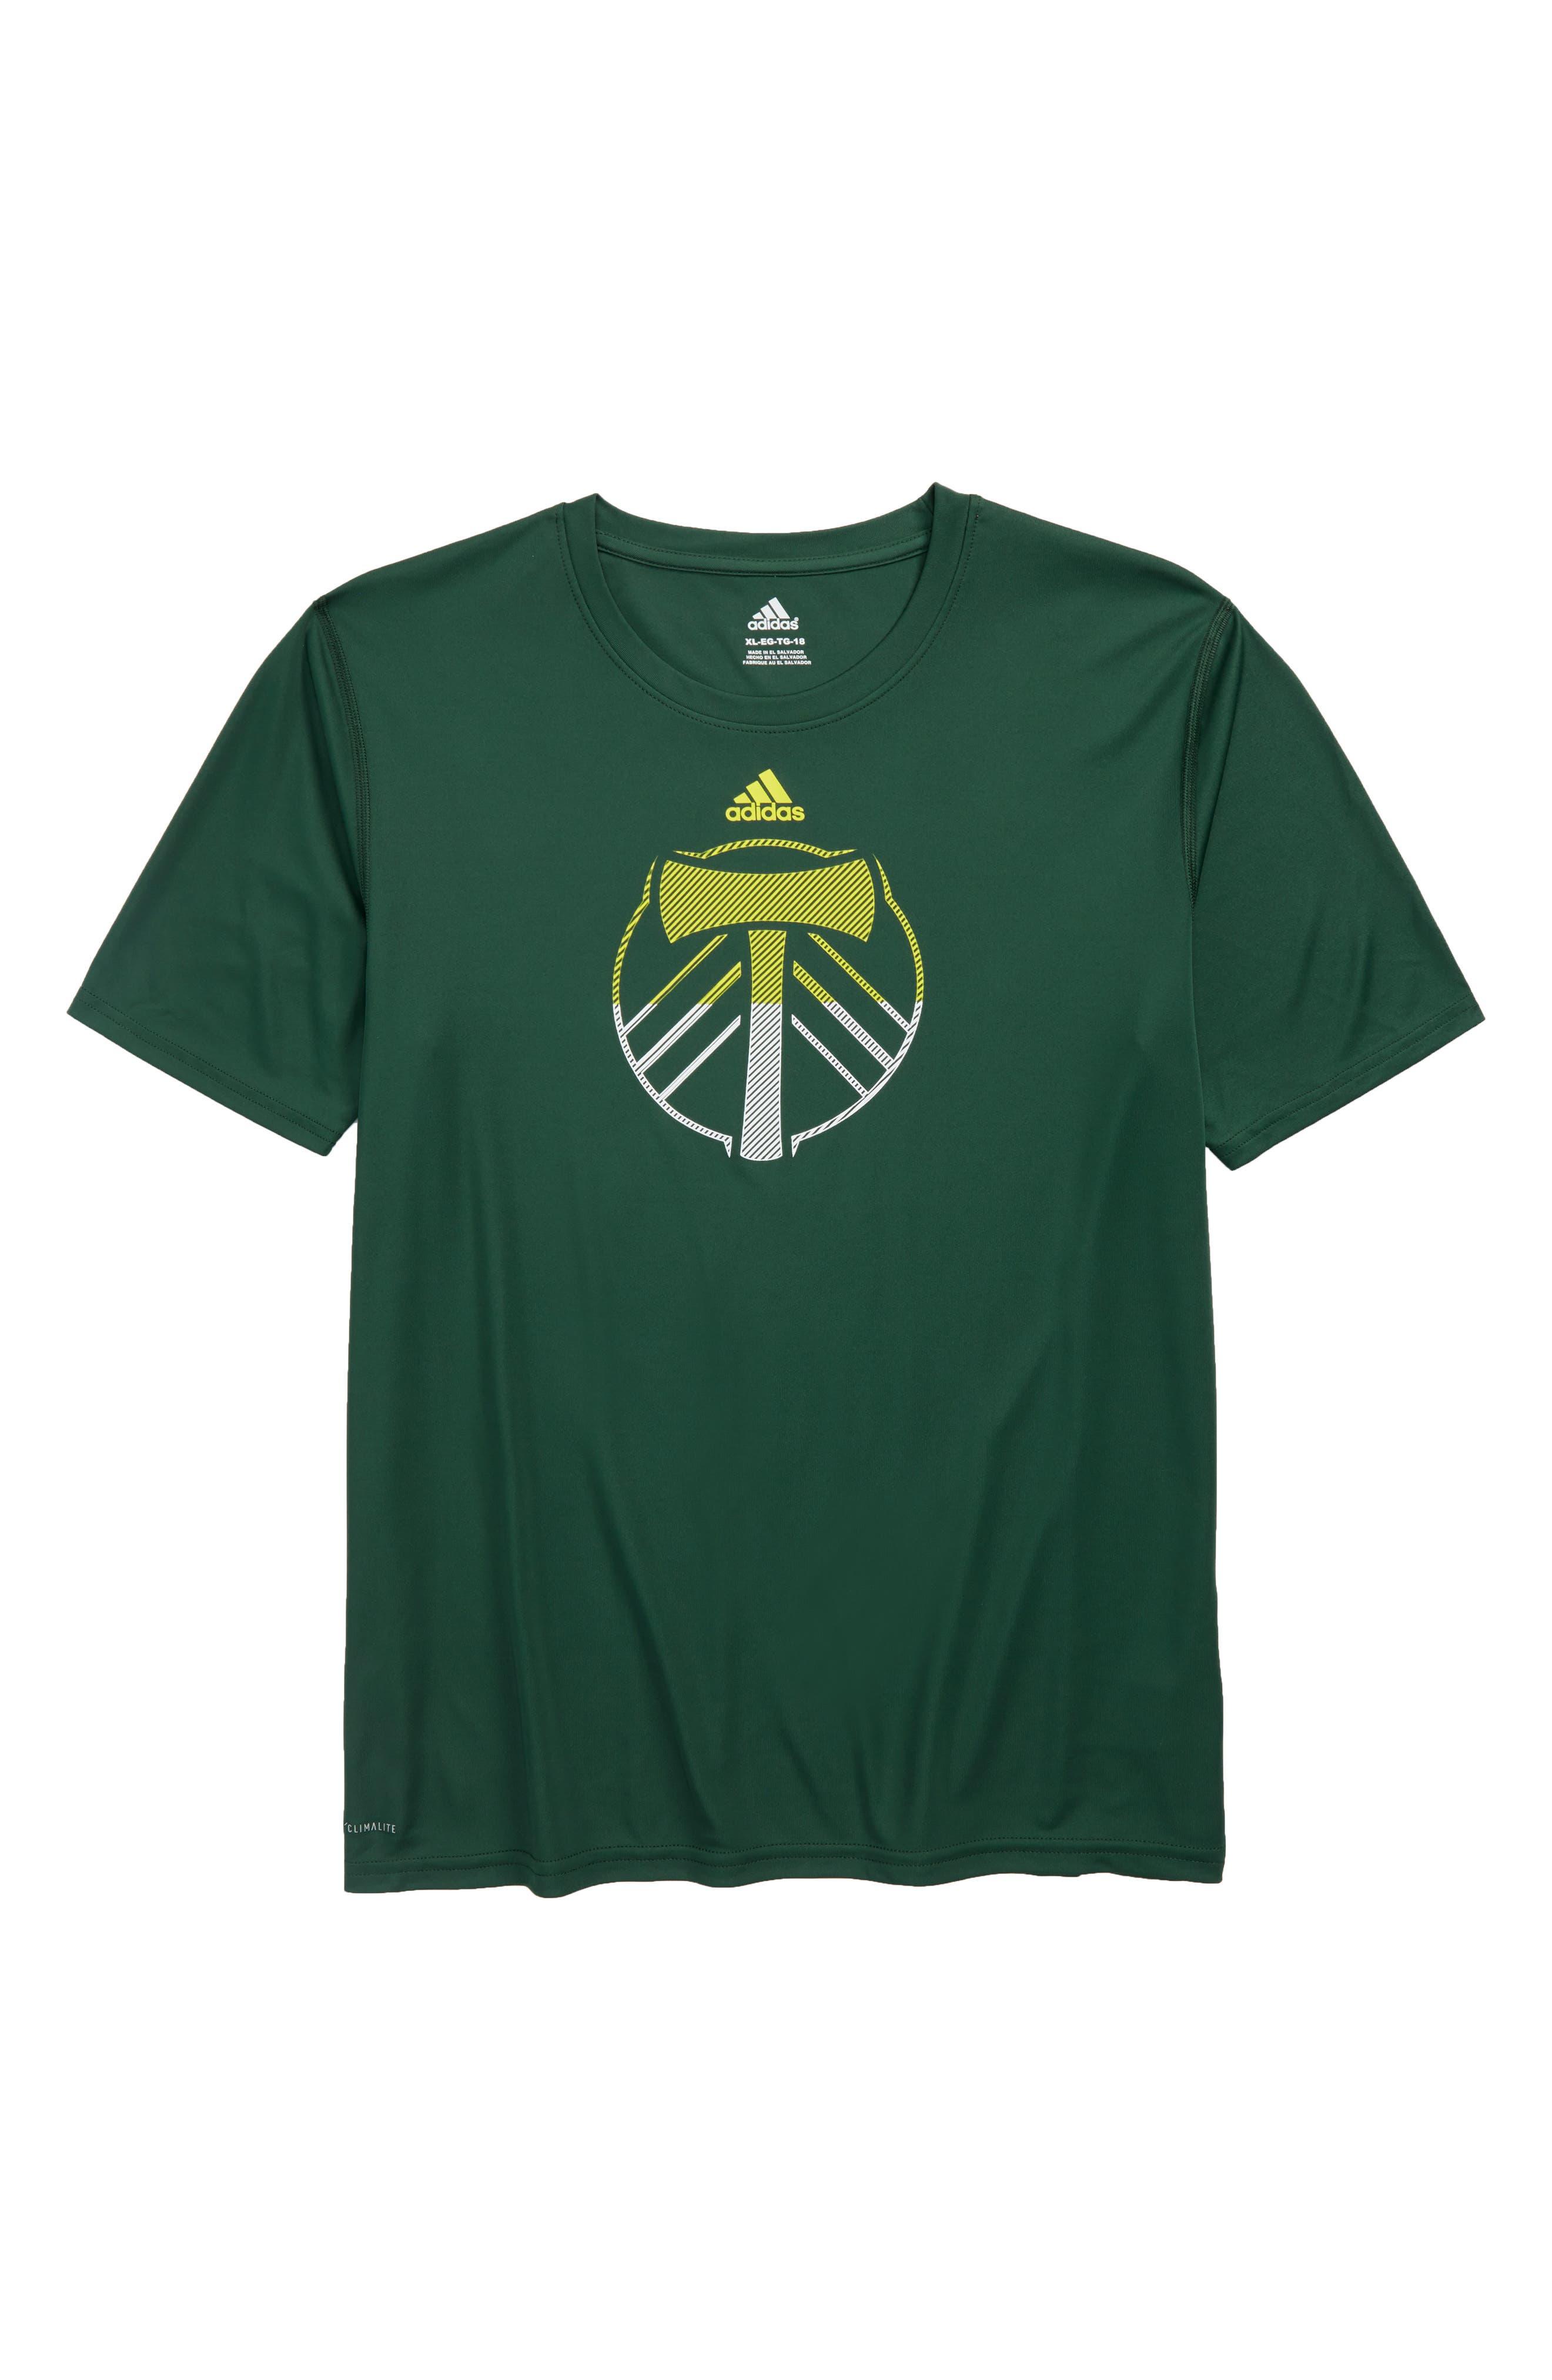 MLS Portland Timbers Climalite<sup>®</sup> T-Shirt,                             Main thumbnail 1, color,                             300